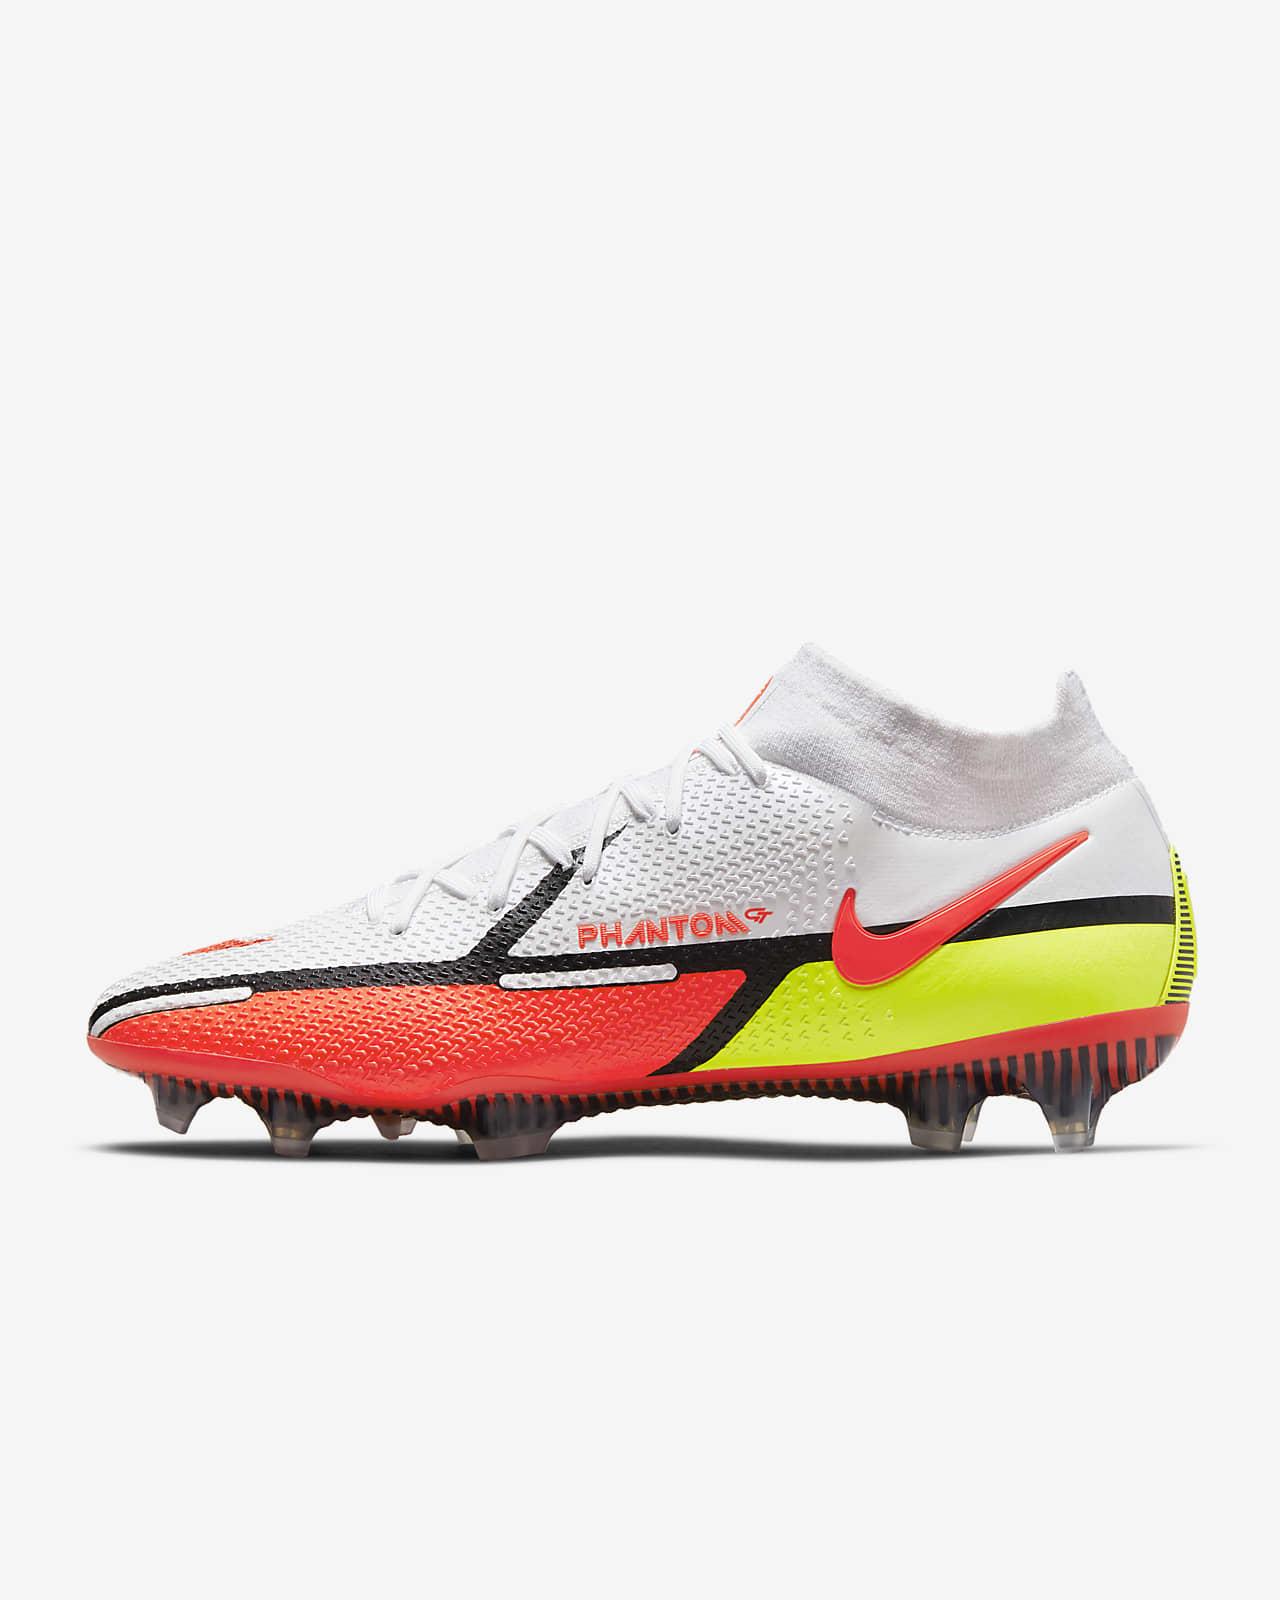 Nike Phantom GT2 Dynamic Fit Elite FG Firm-Ground Soccer Cleat